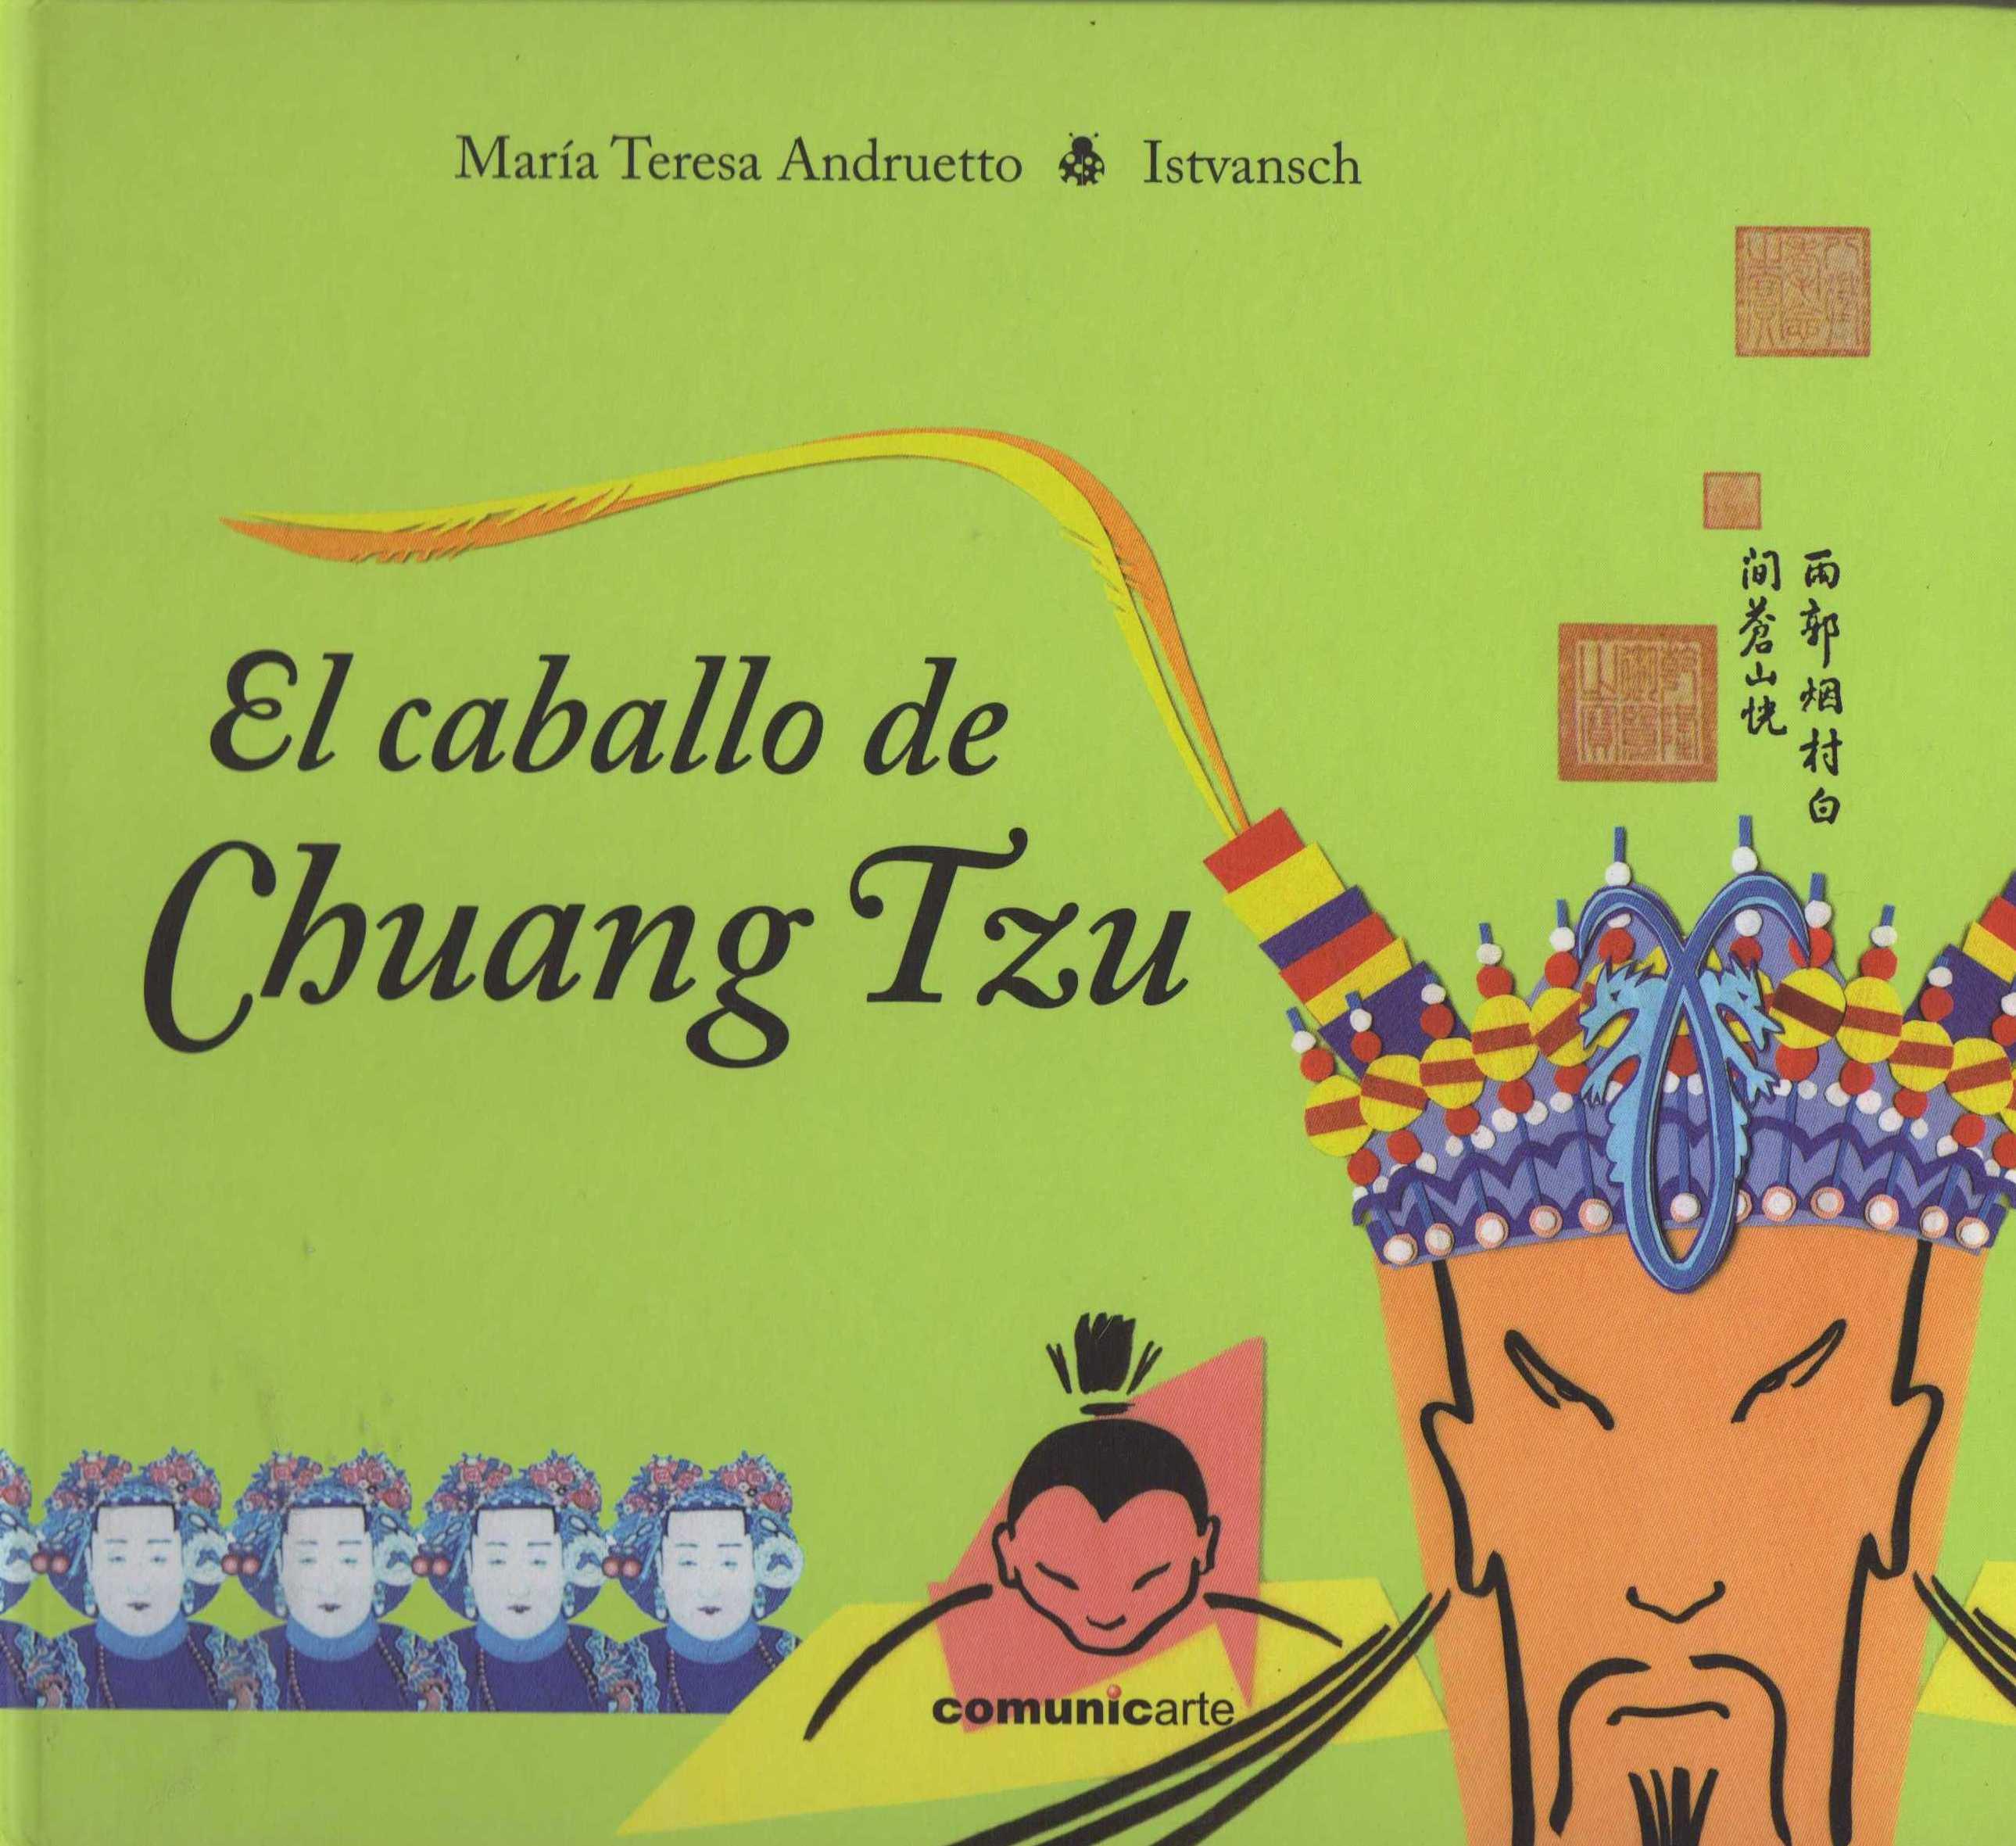 Chuang Tzu's horse (El Caballo de Chuang Tzu)